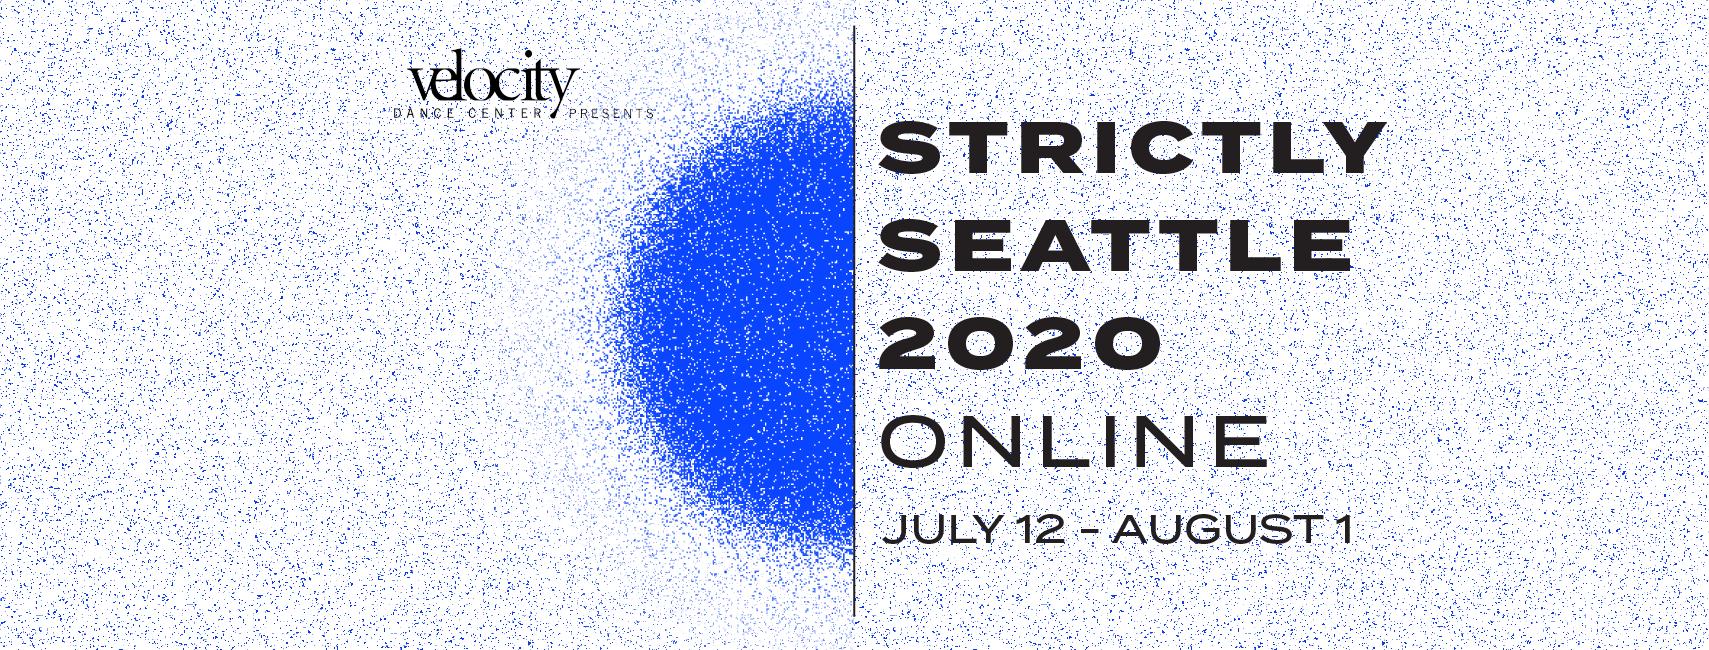 STRICTLY SEATTLE 2020 | ONLINE